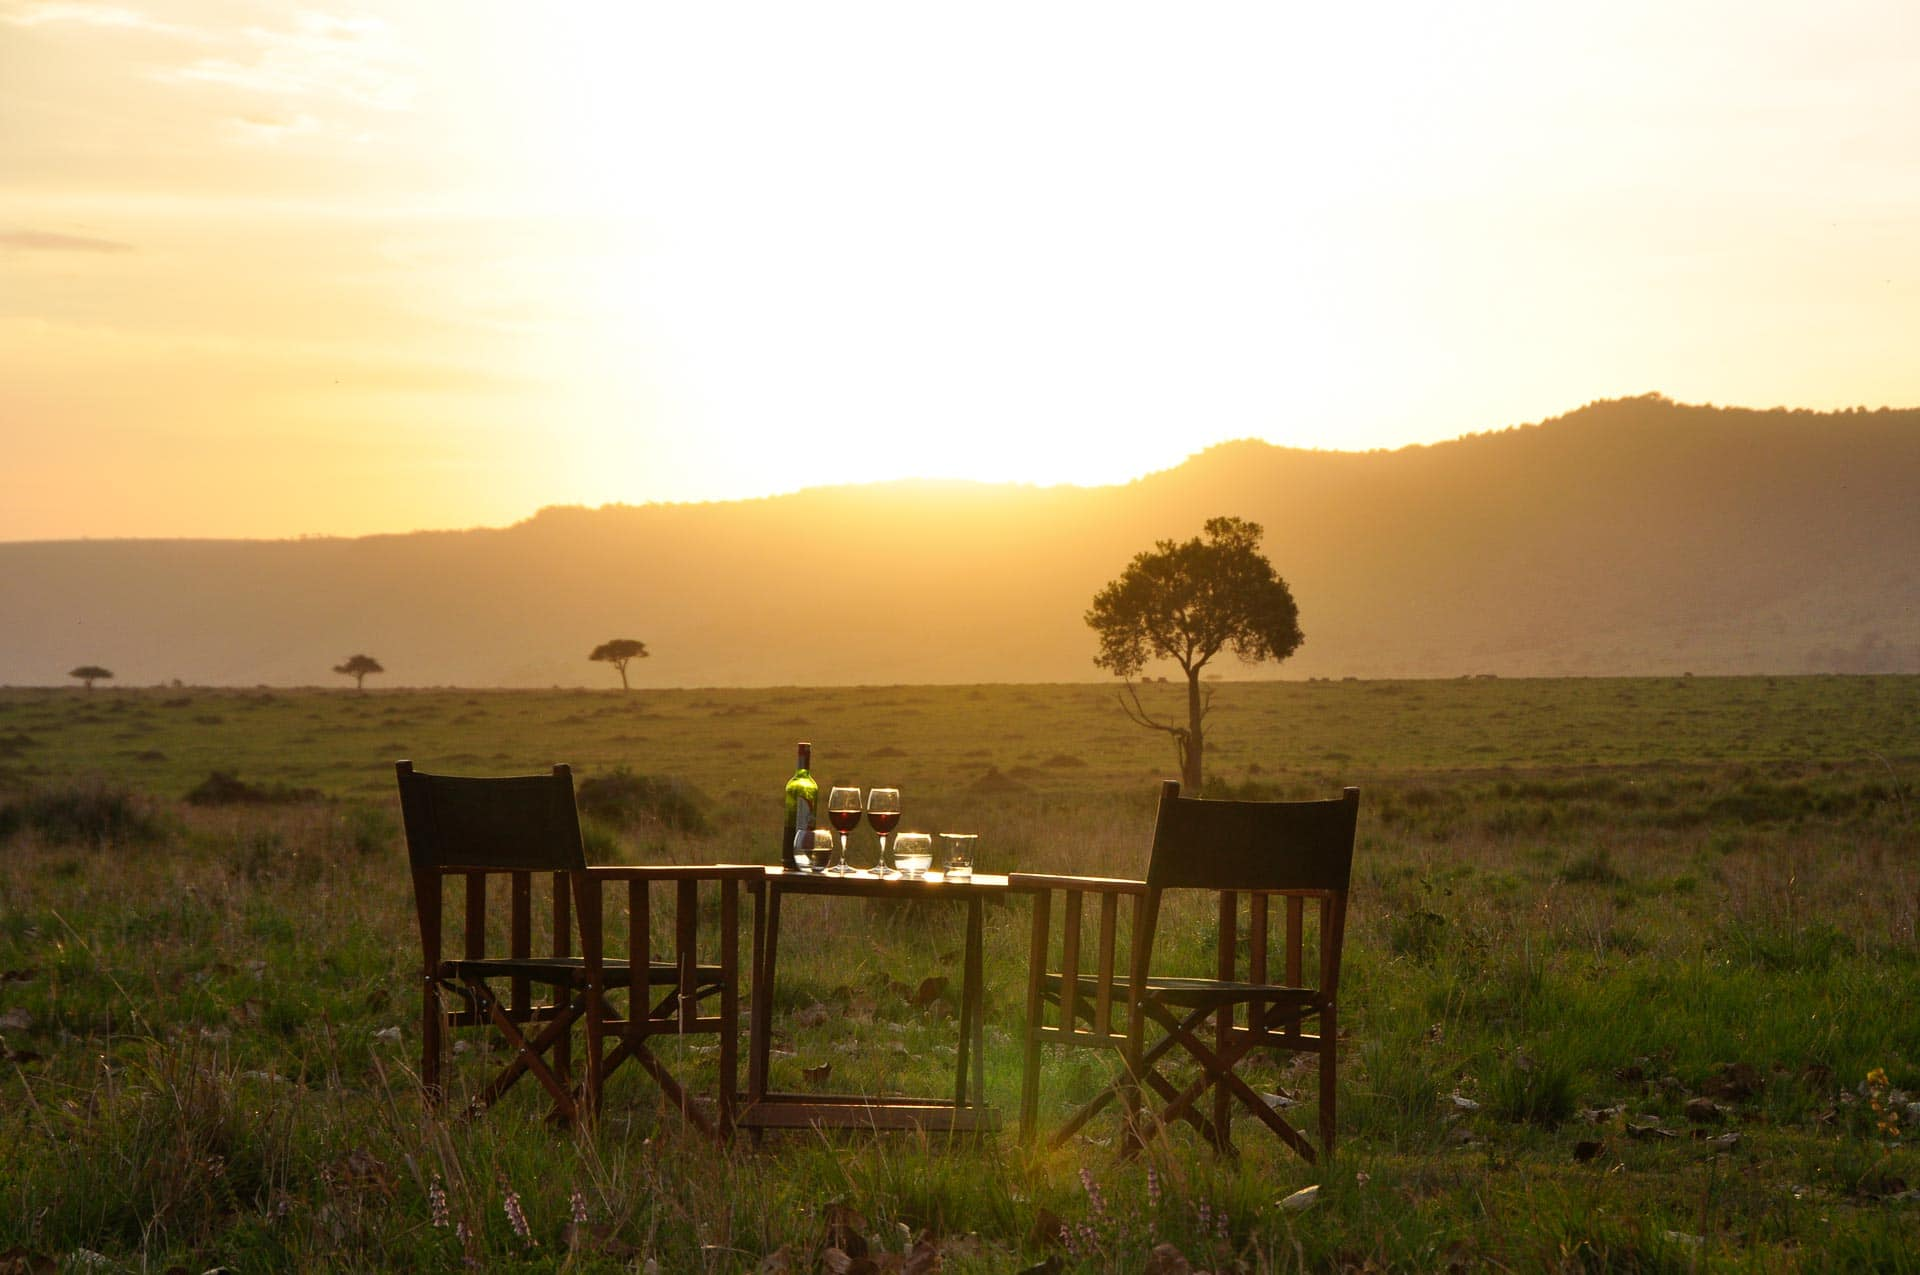 Masai-Mara-Sundowner-Kenia-Globetrotter-Select-6